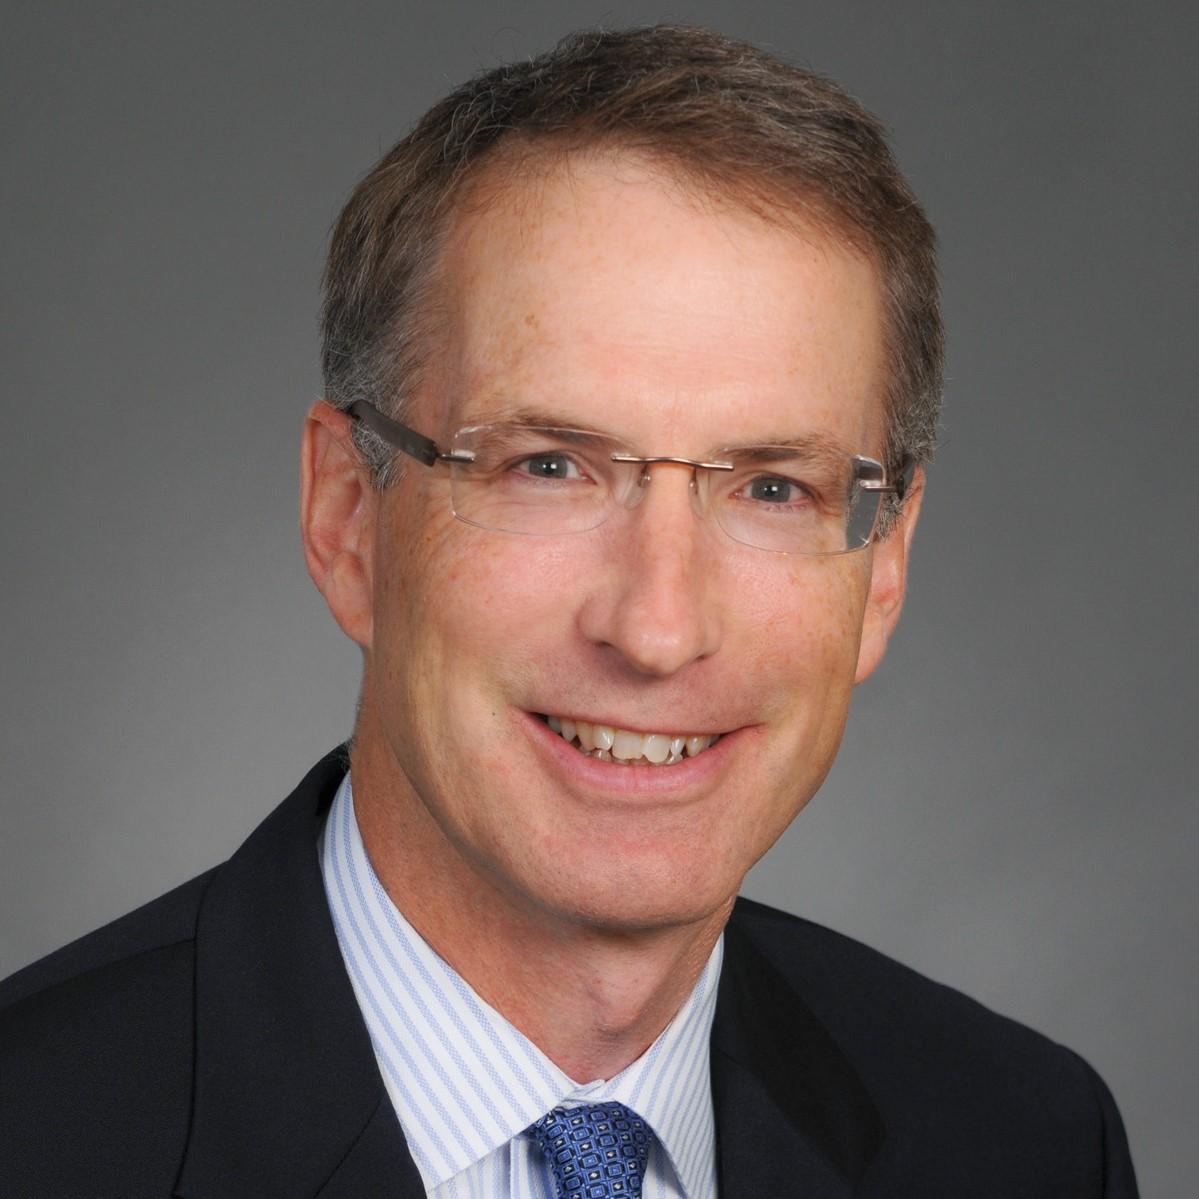 Andy Majewski